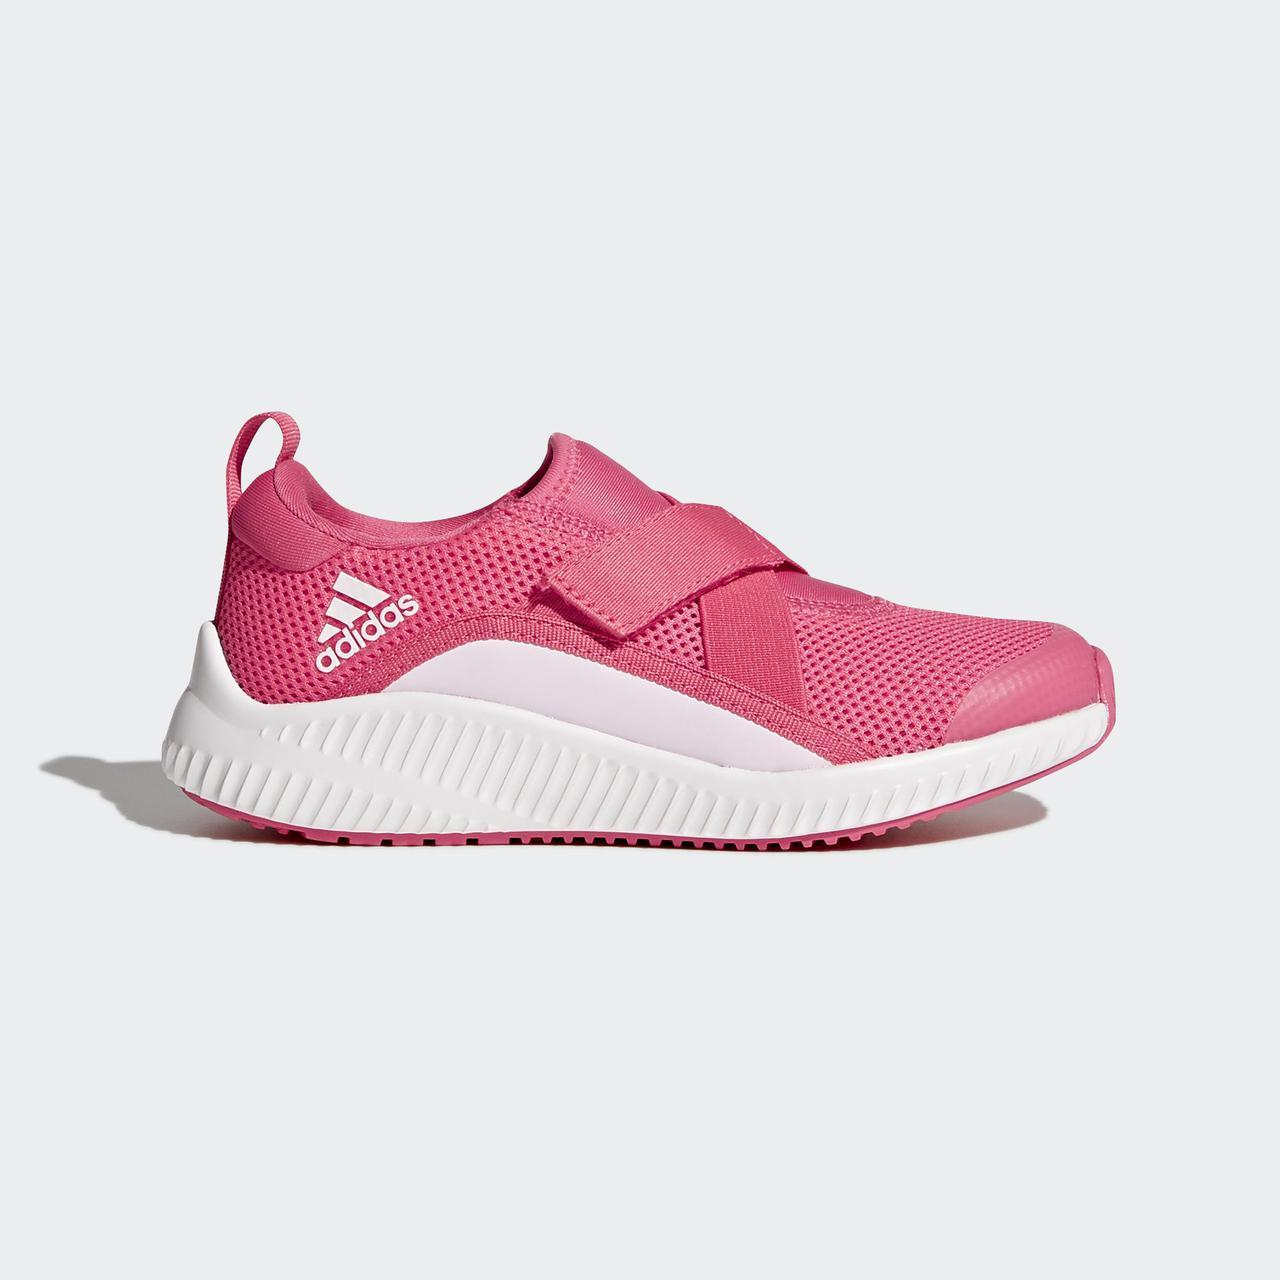 310e57357d54 Детские кроссовки Adidas Performance Fortarun X (Артикул  CQ2449) - Интернет -магазин «